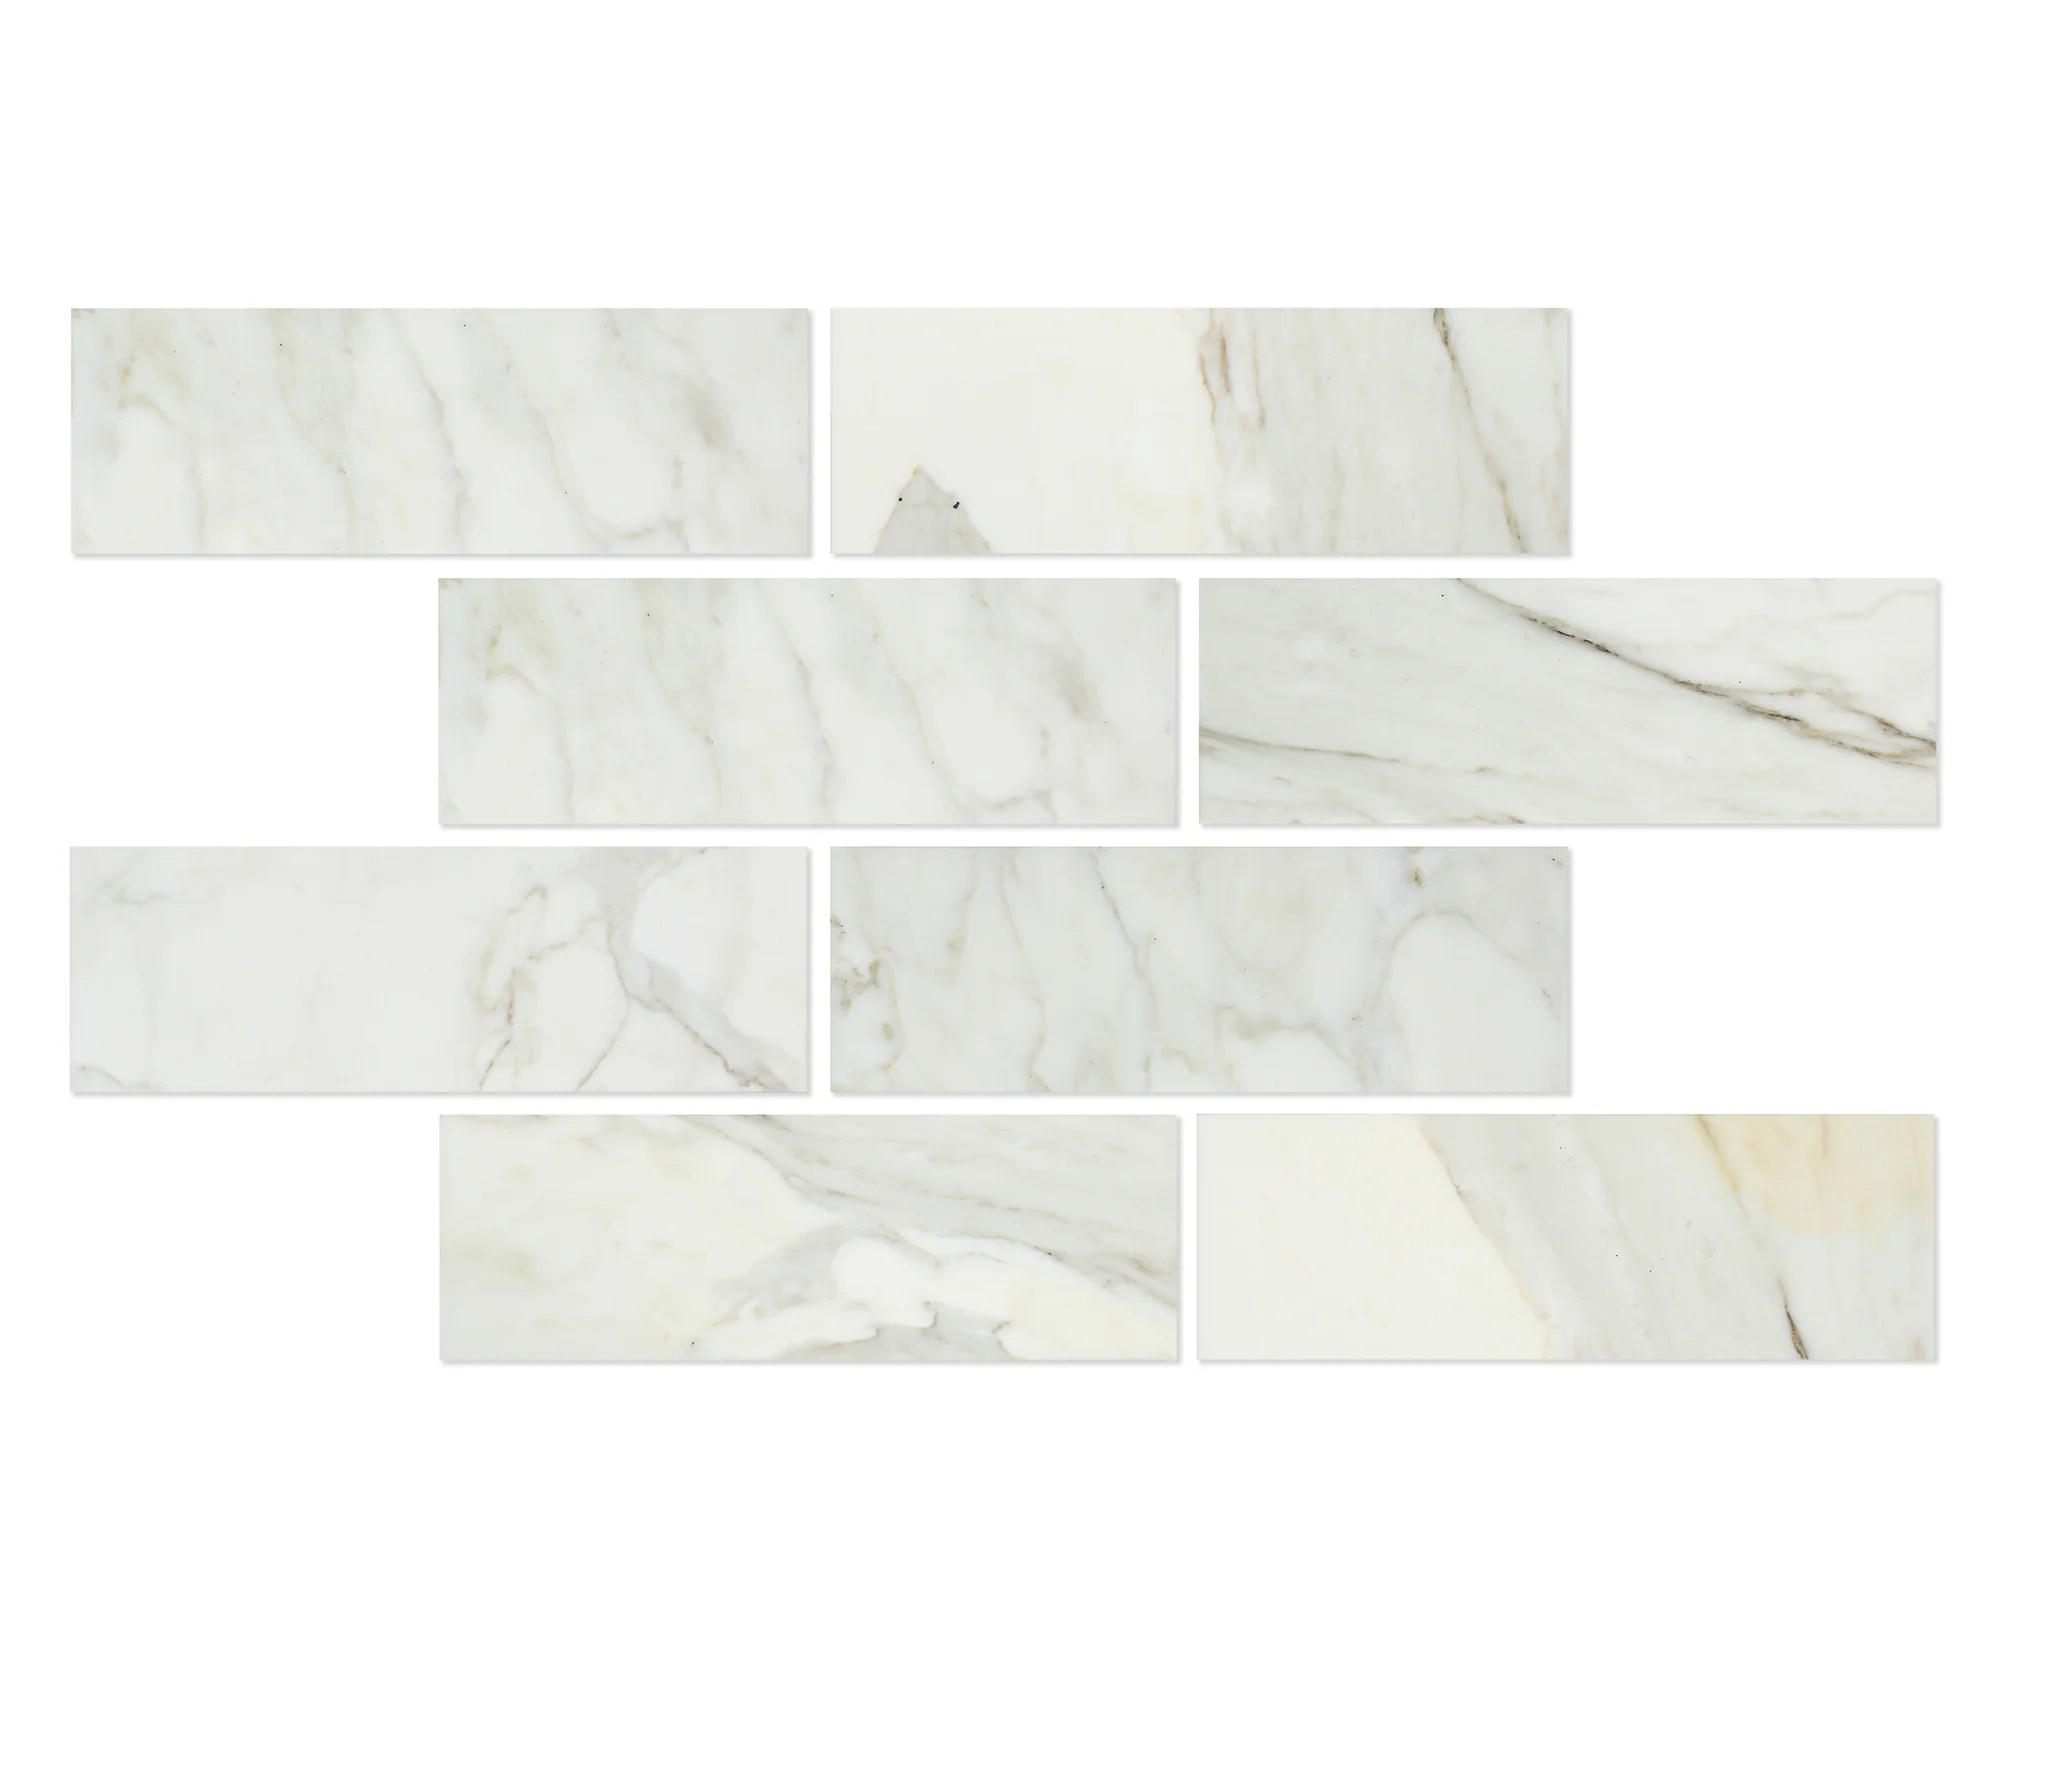 calacatta gold marble 4x12 subway tile